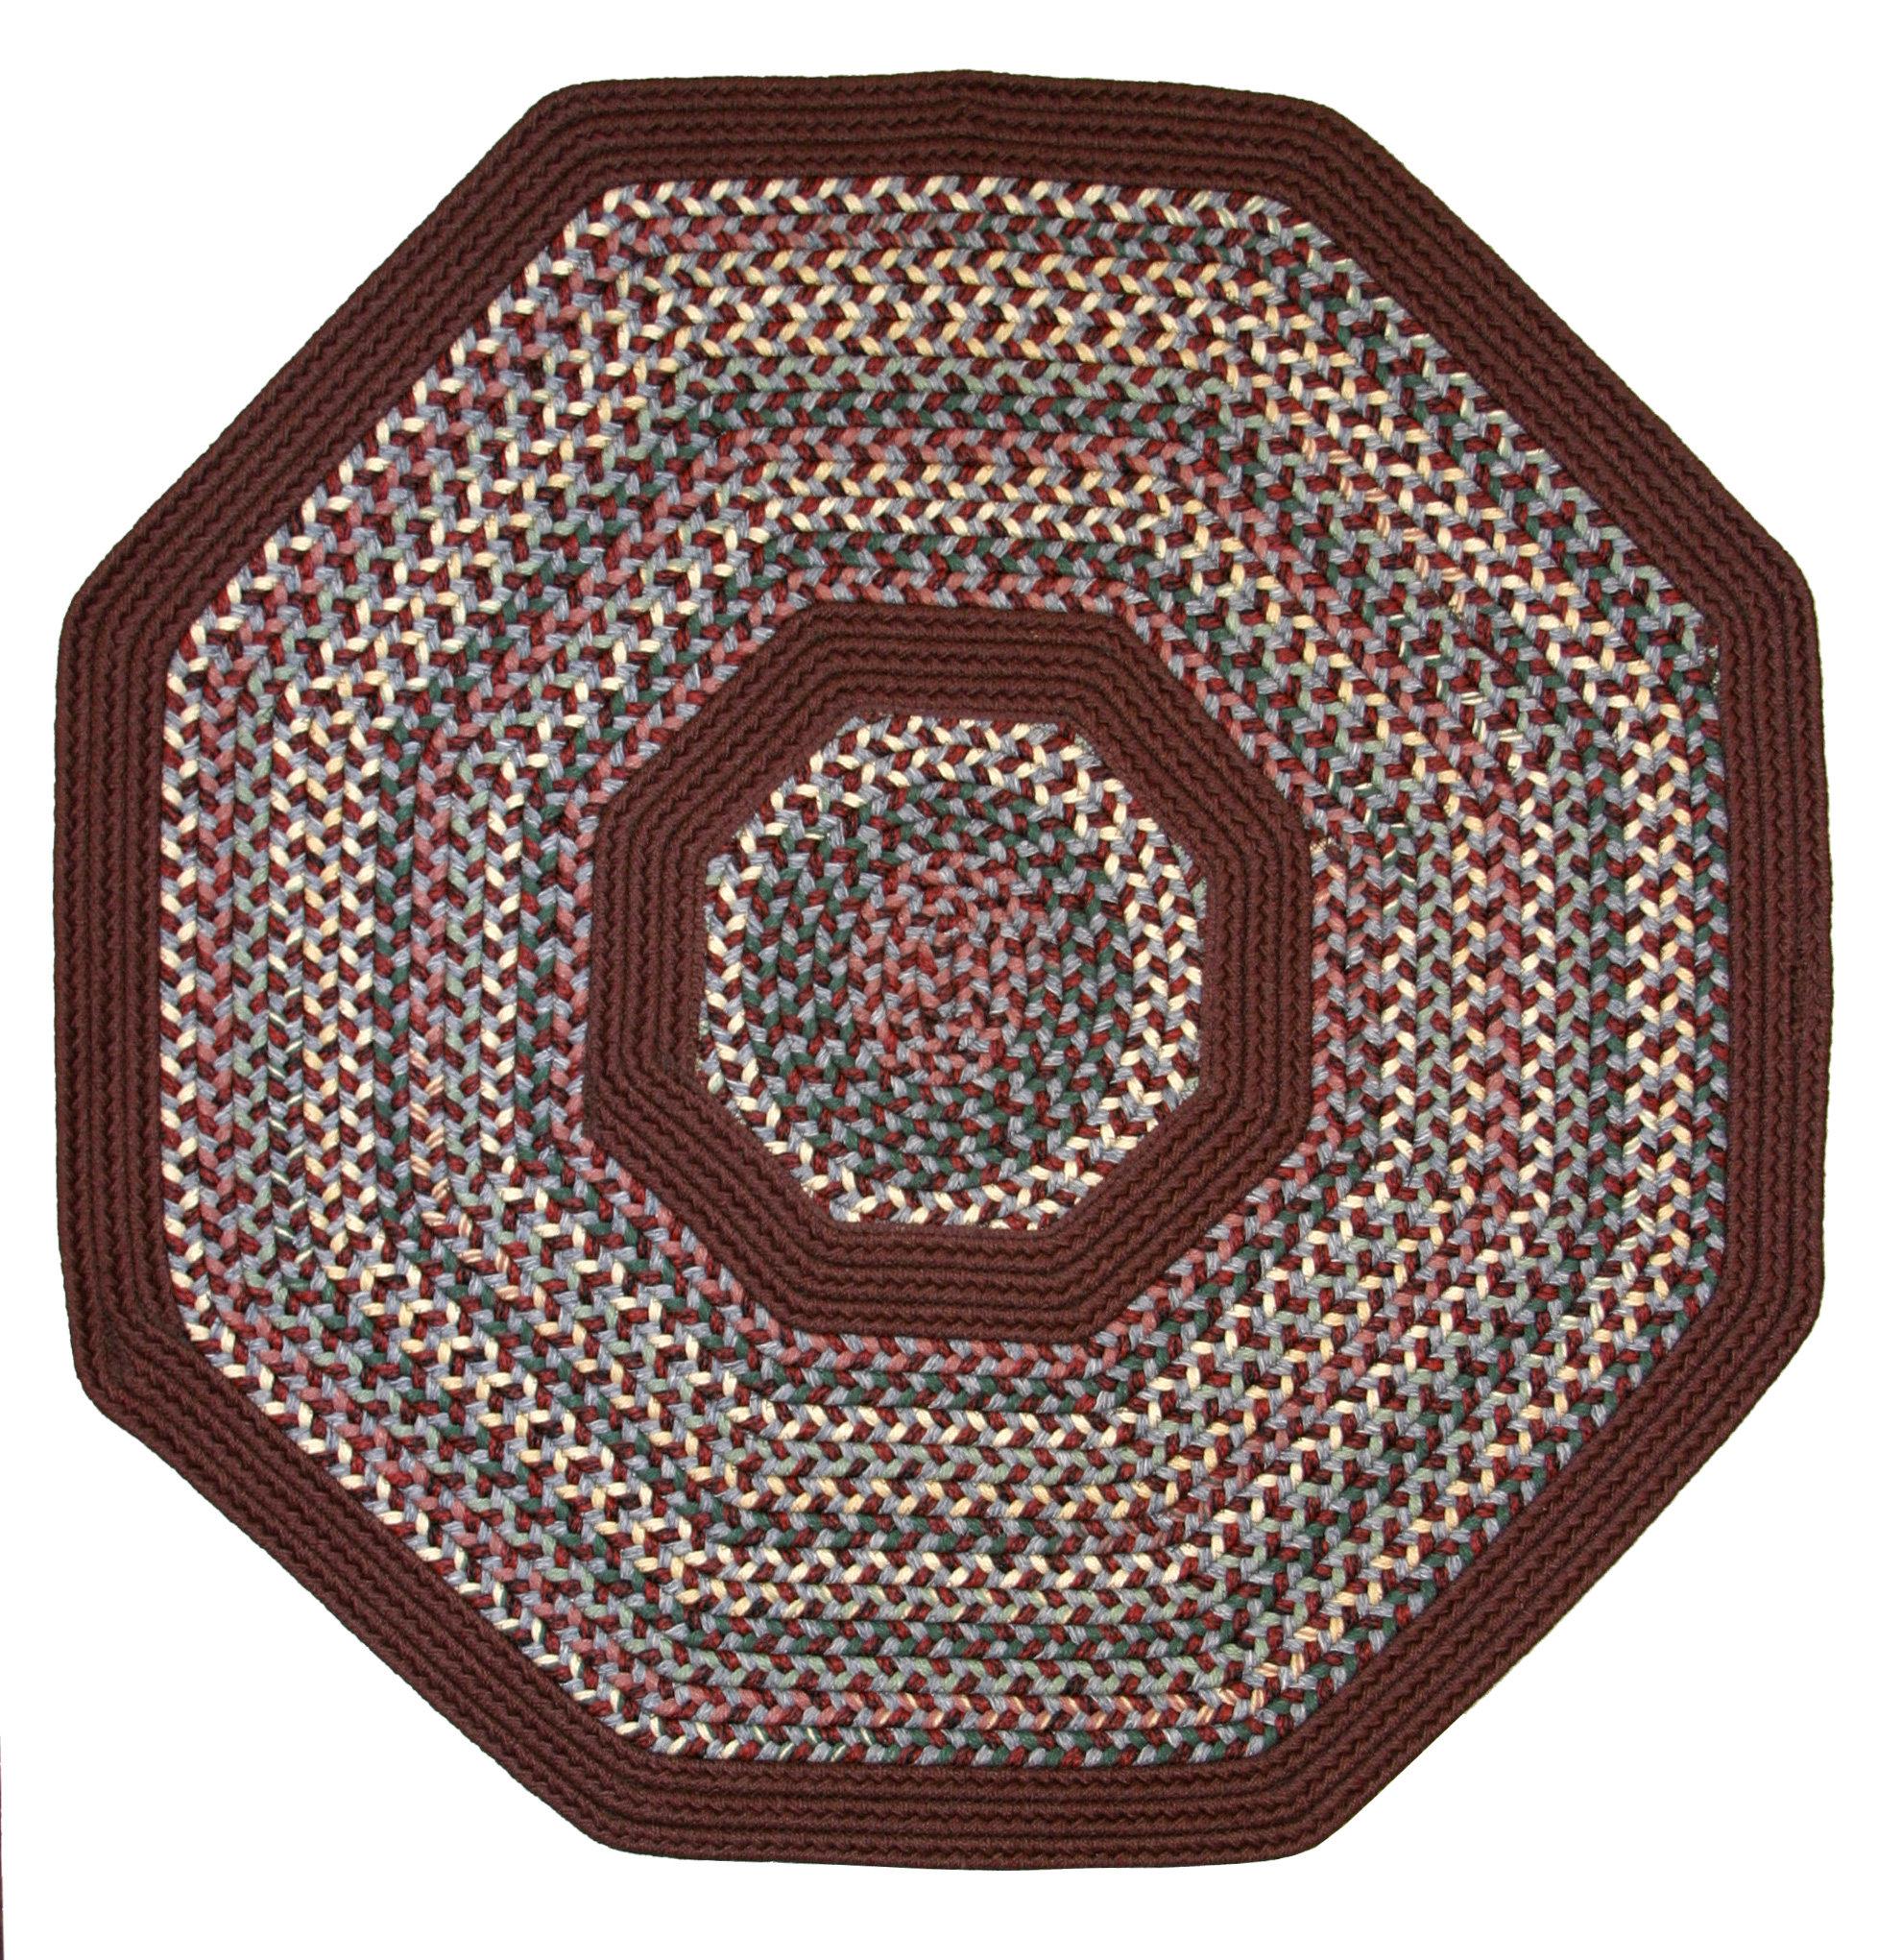 Thorndike Mills Pioneer Valley Ii Indian Summer With Burgundy Solids Octagon Rug Wayfair